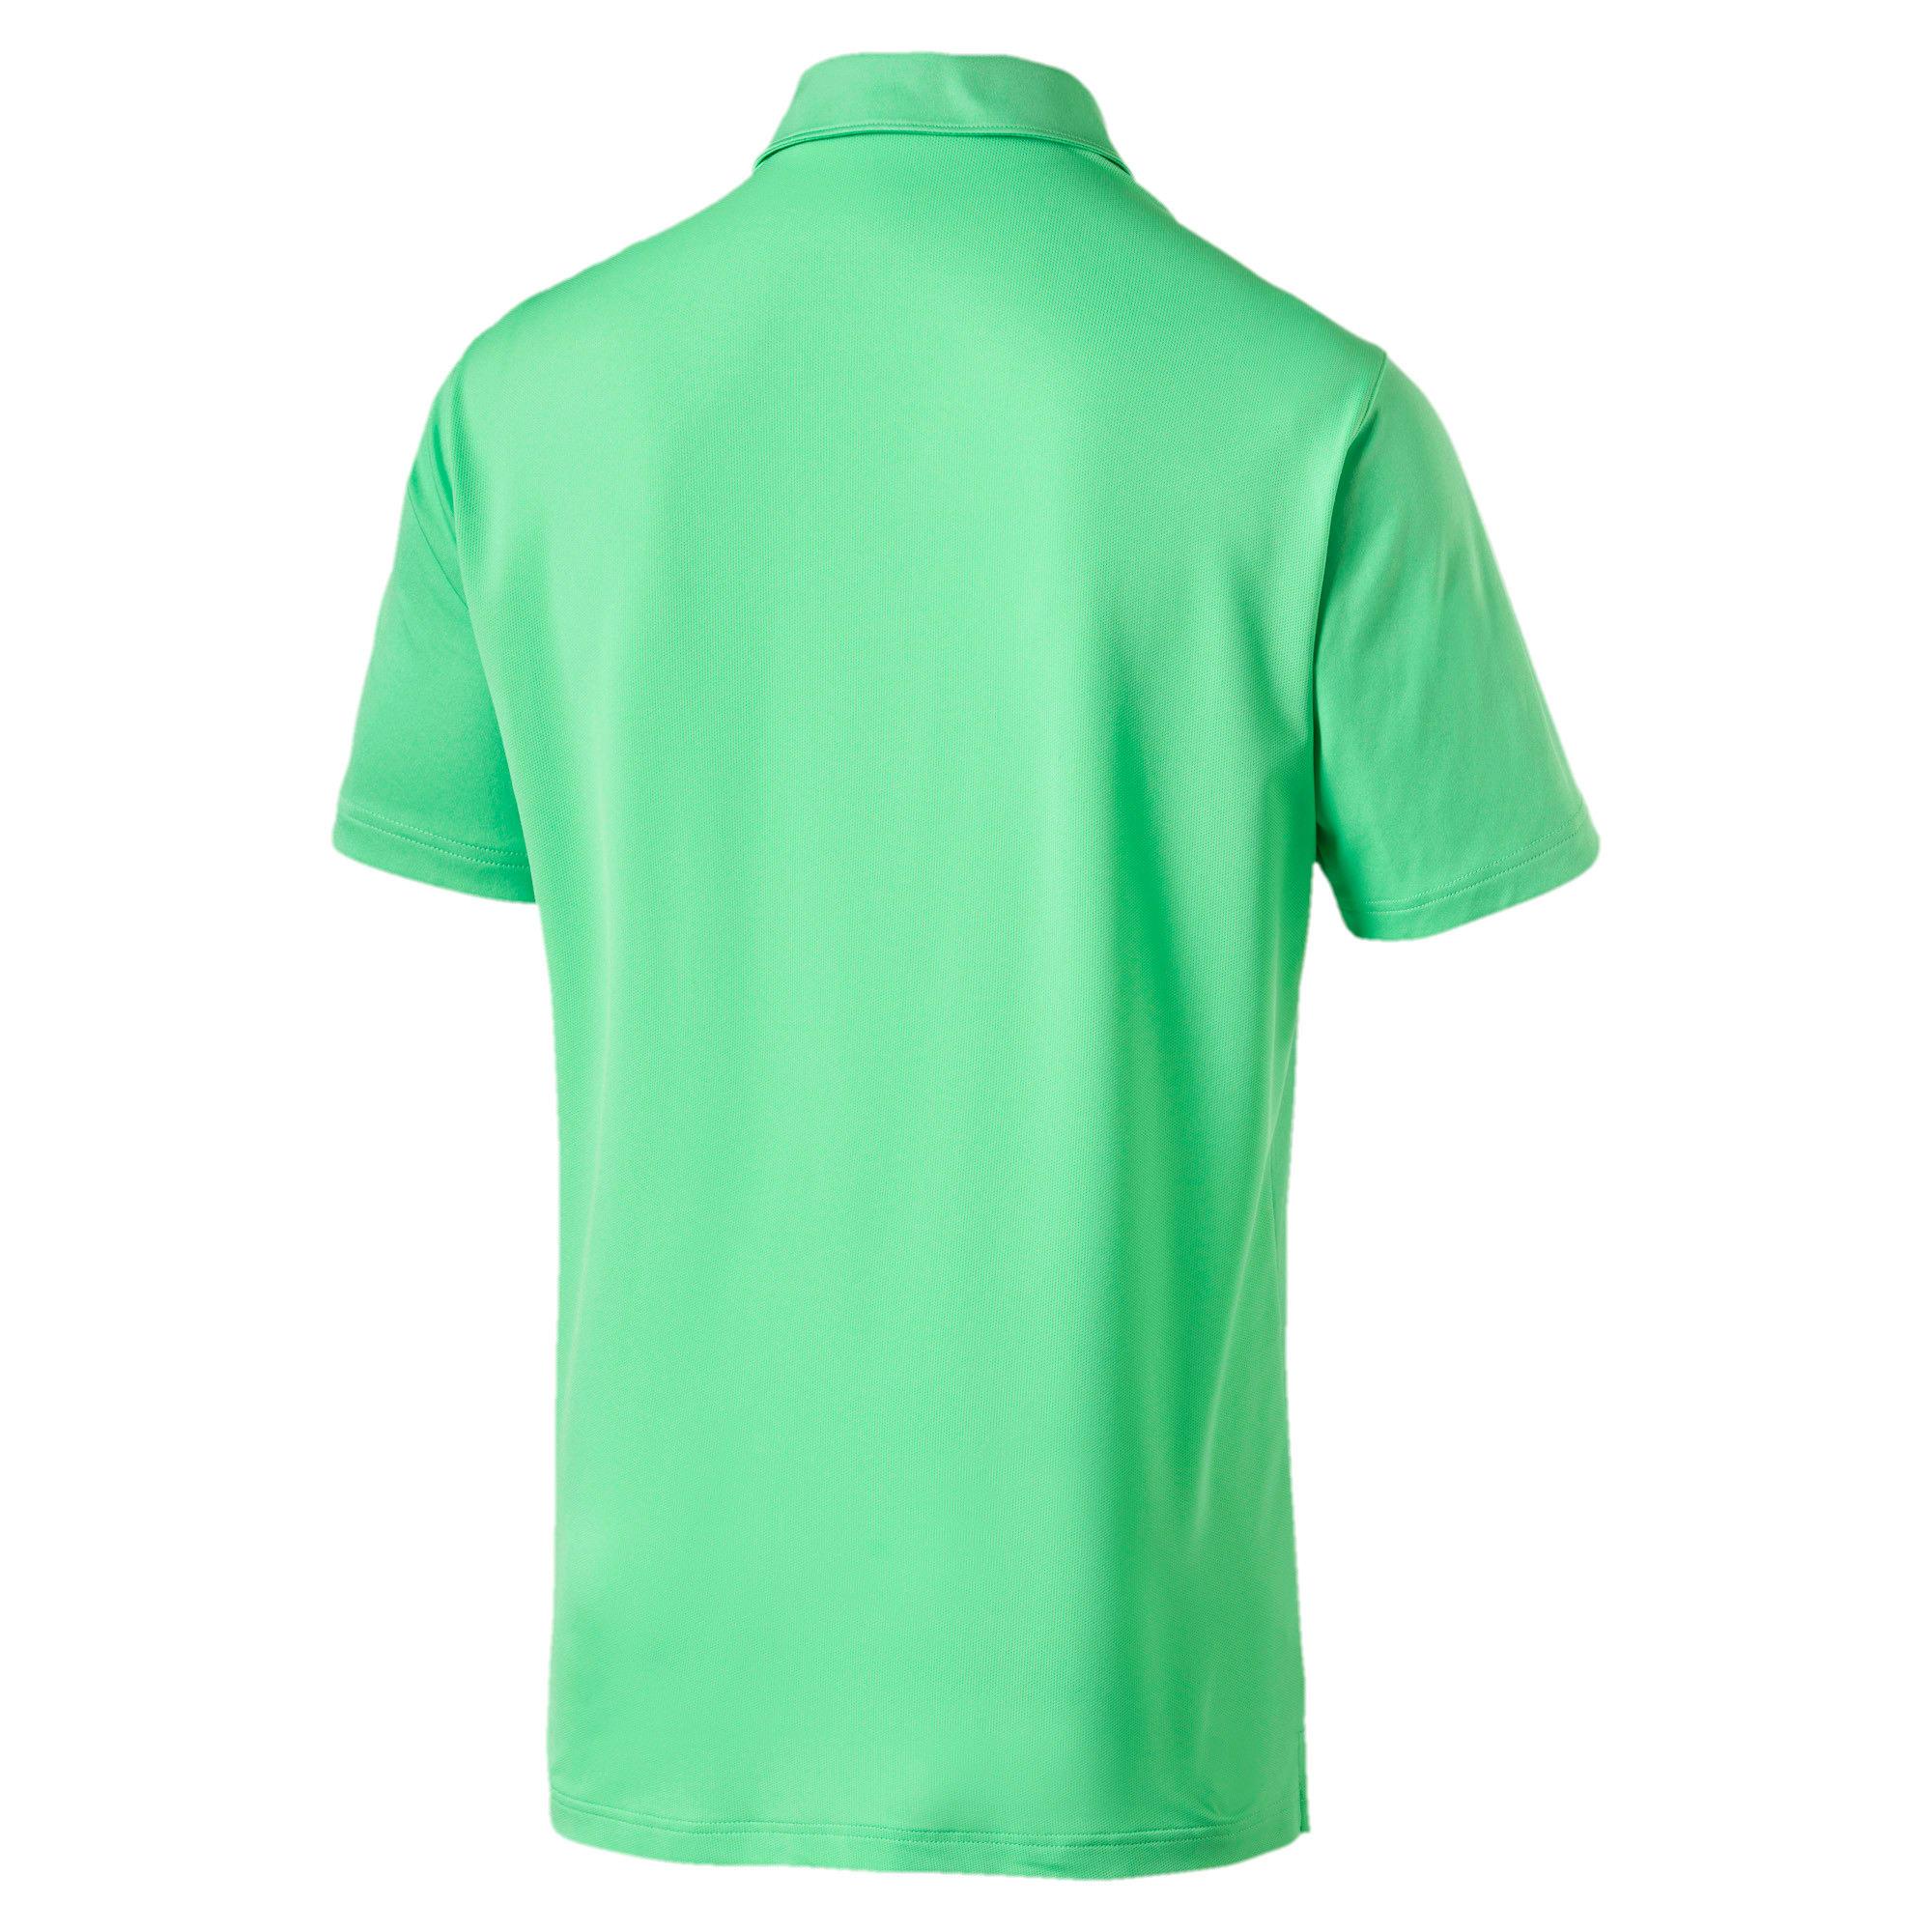 Thumbnail 5 of Rotation Men's Golf Polo, Irish Green, medium